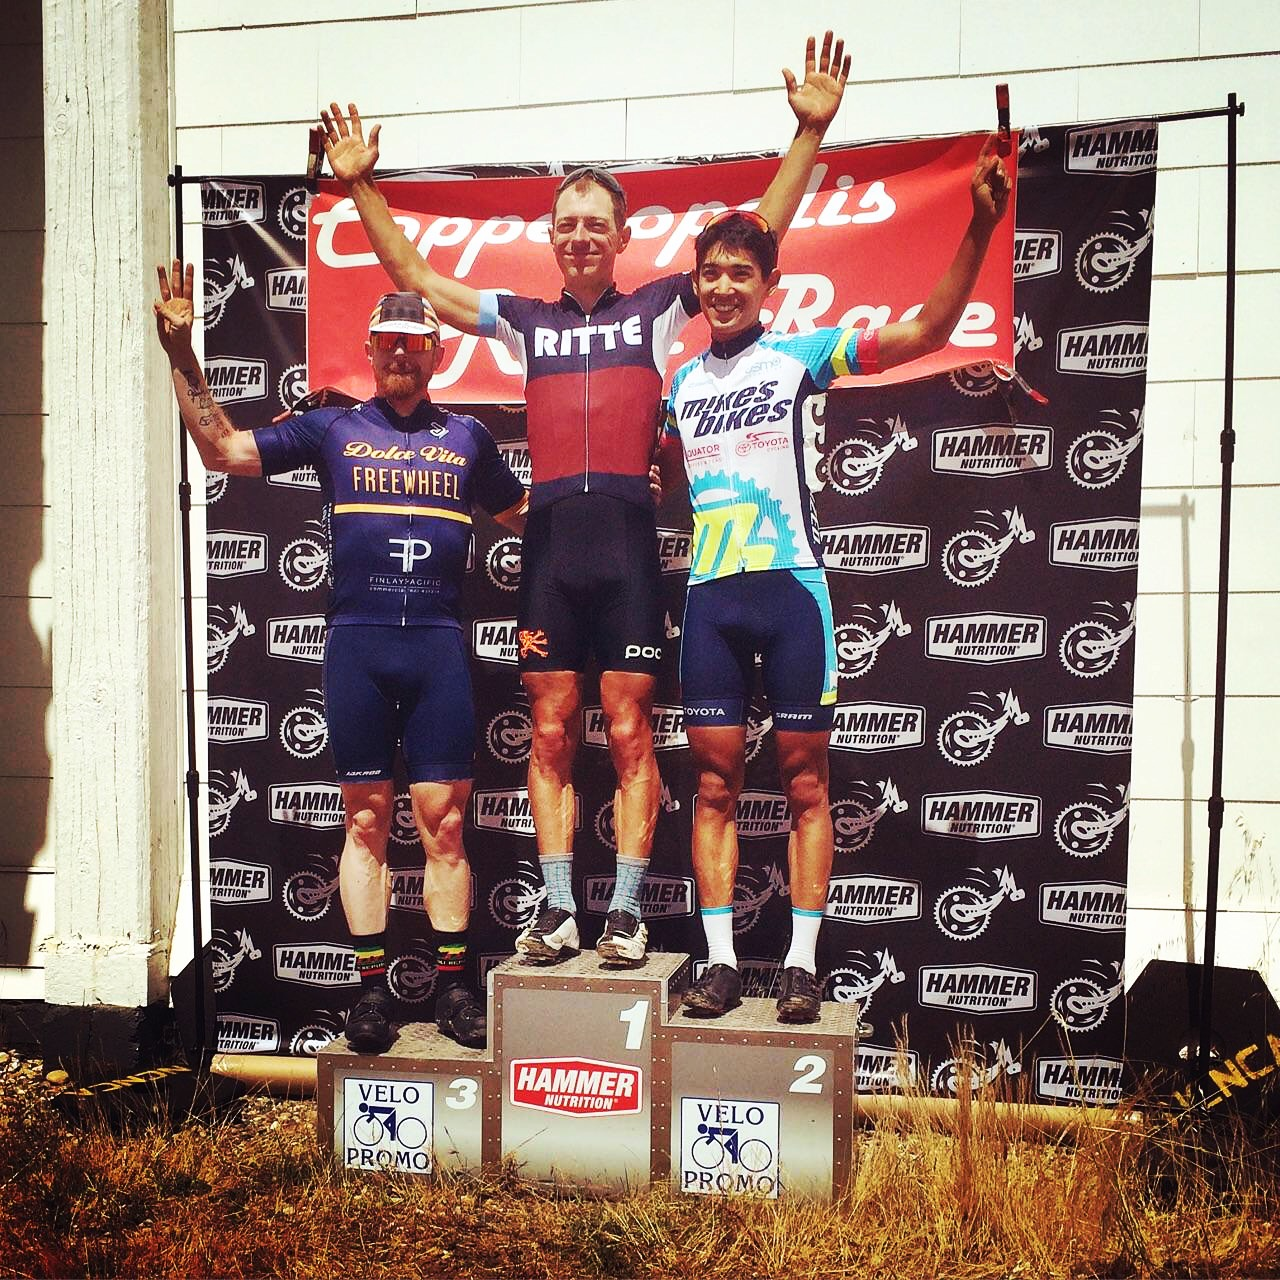 copperopolis-road-race.jpg